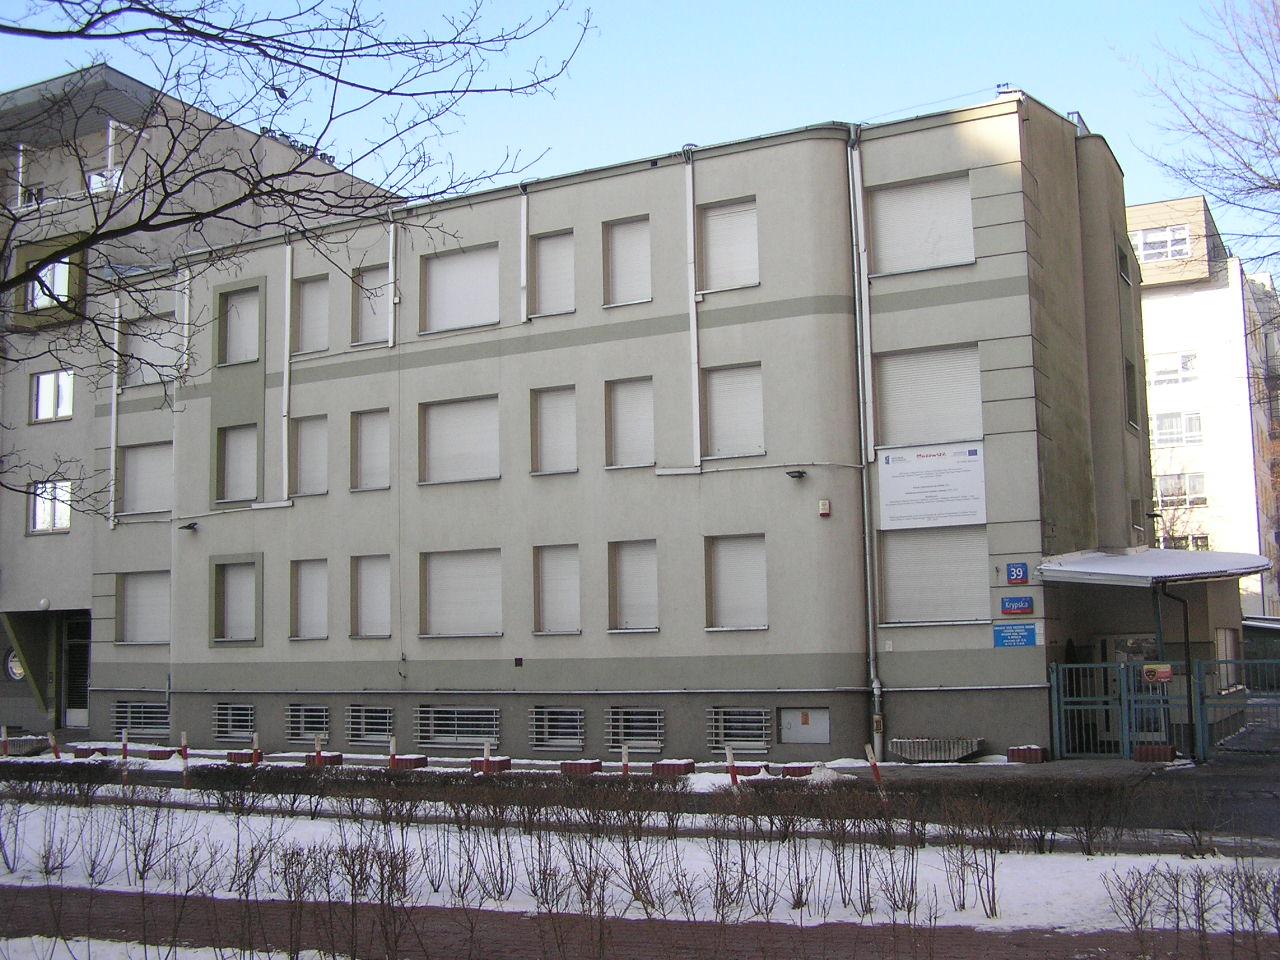 Krypska 39